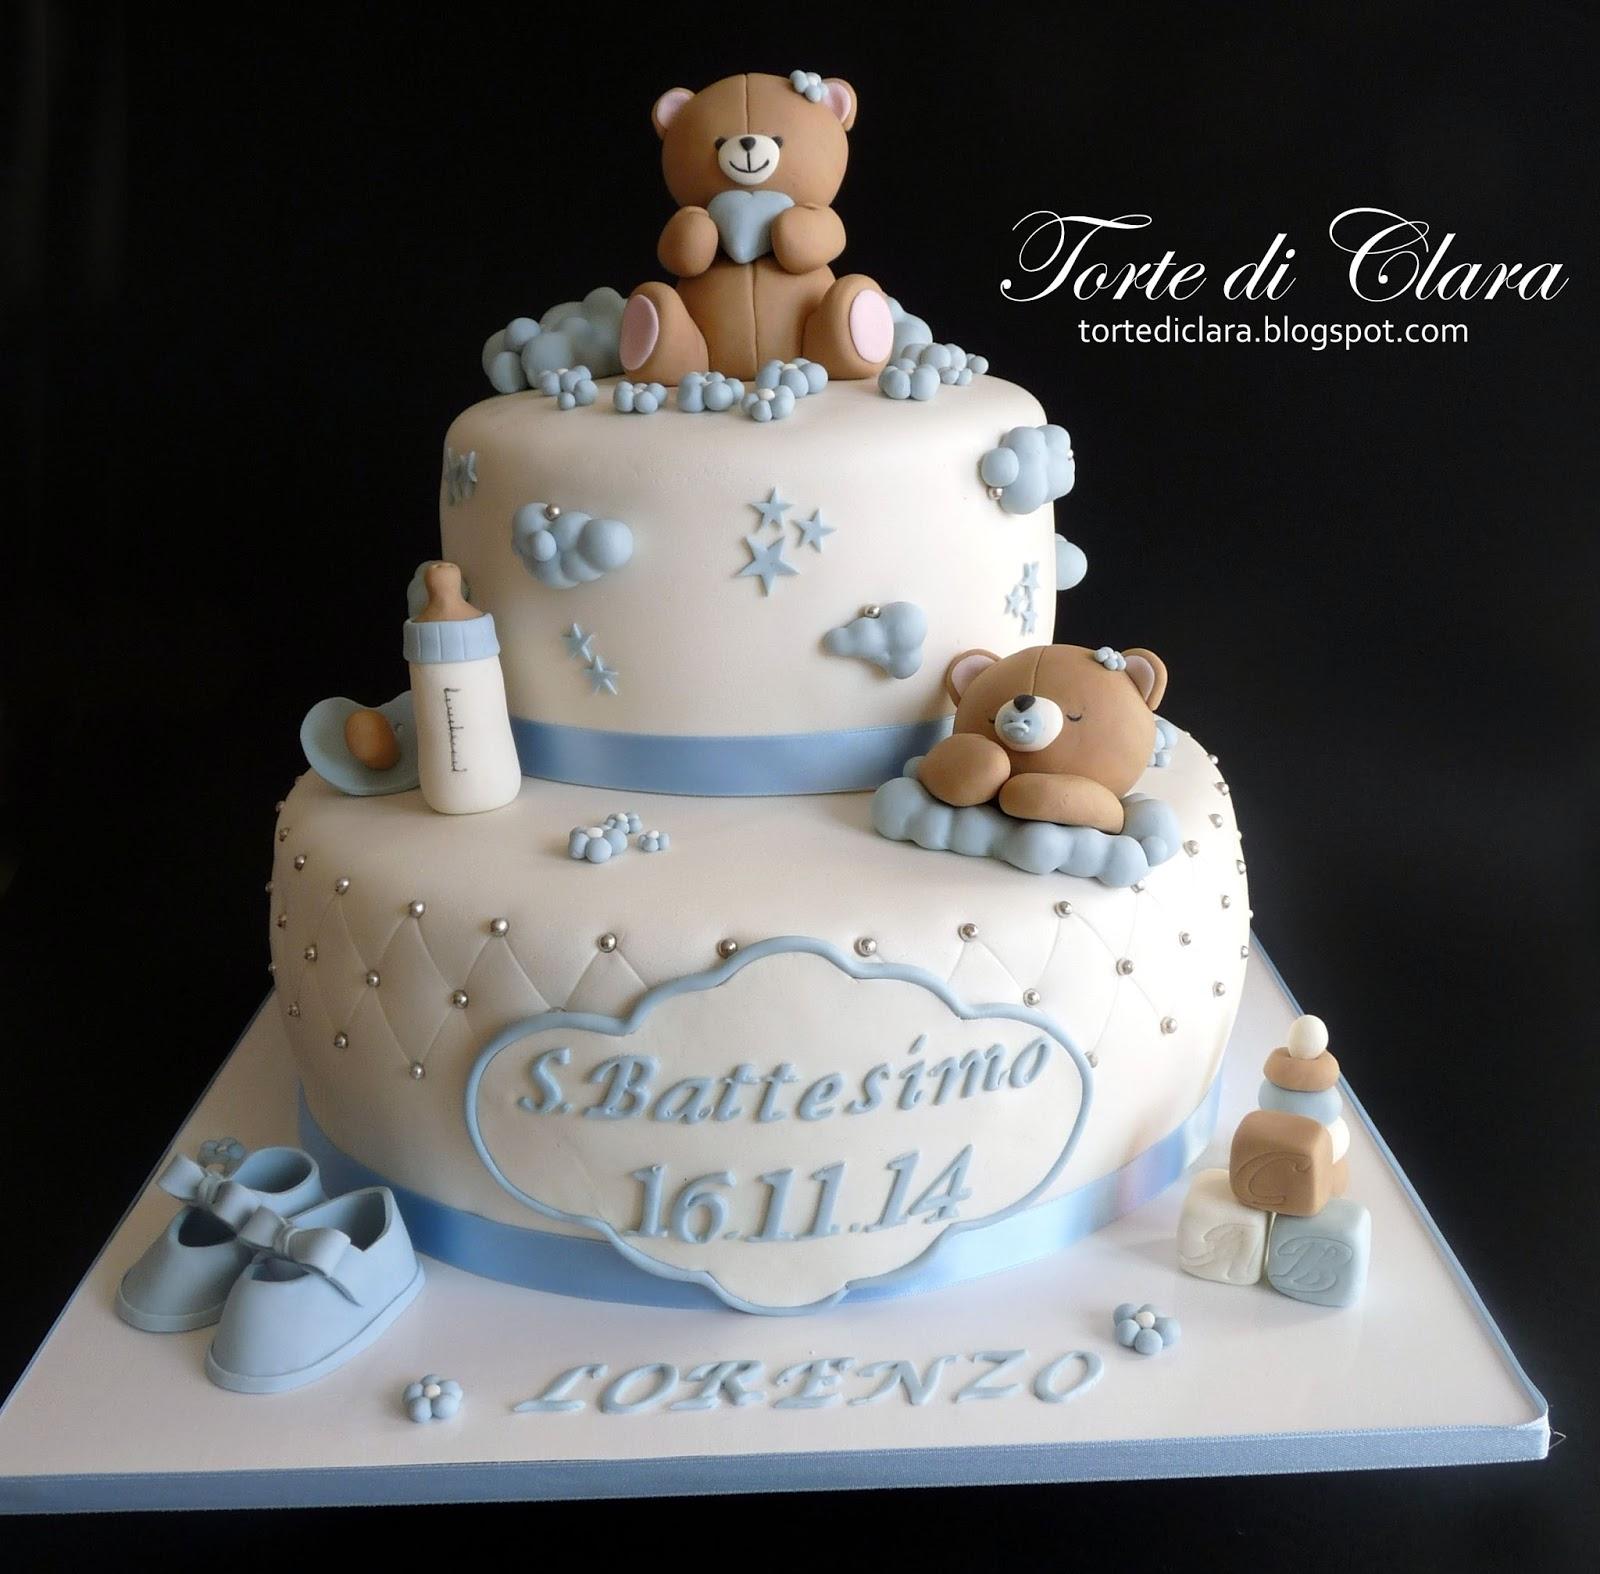 Popolare Torte di Clara: Torta Battesimo (7) TE64